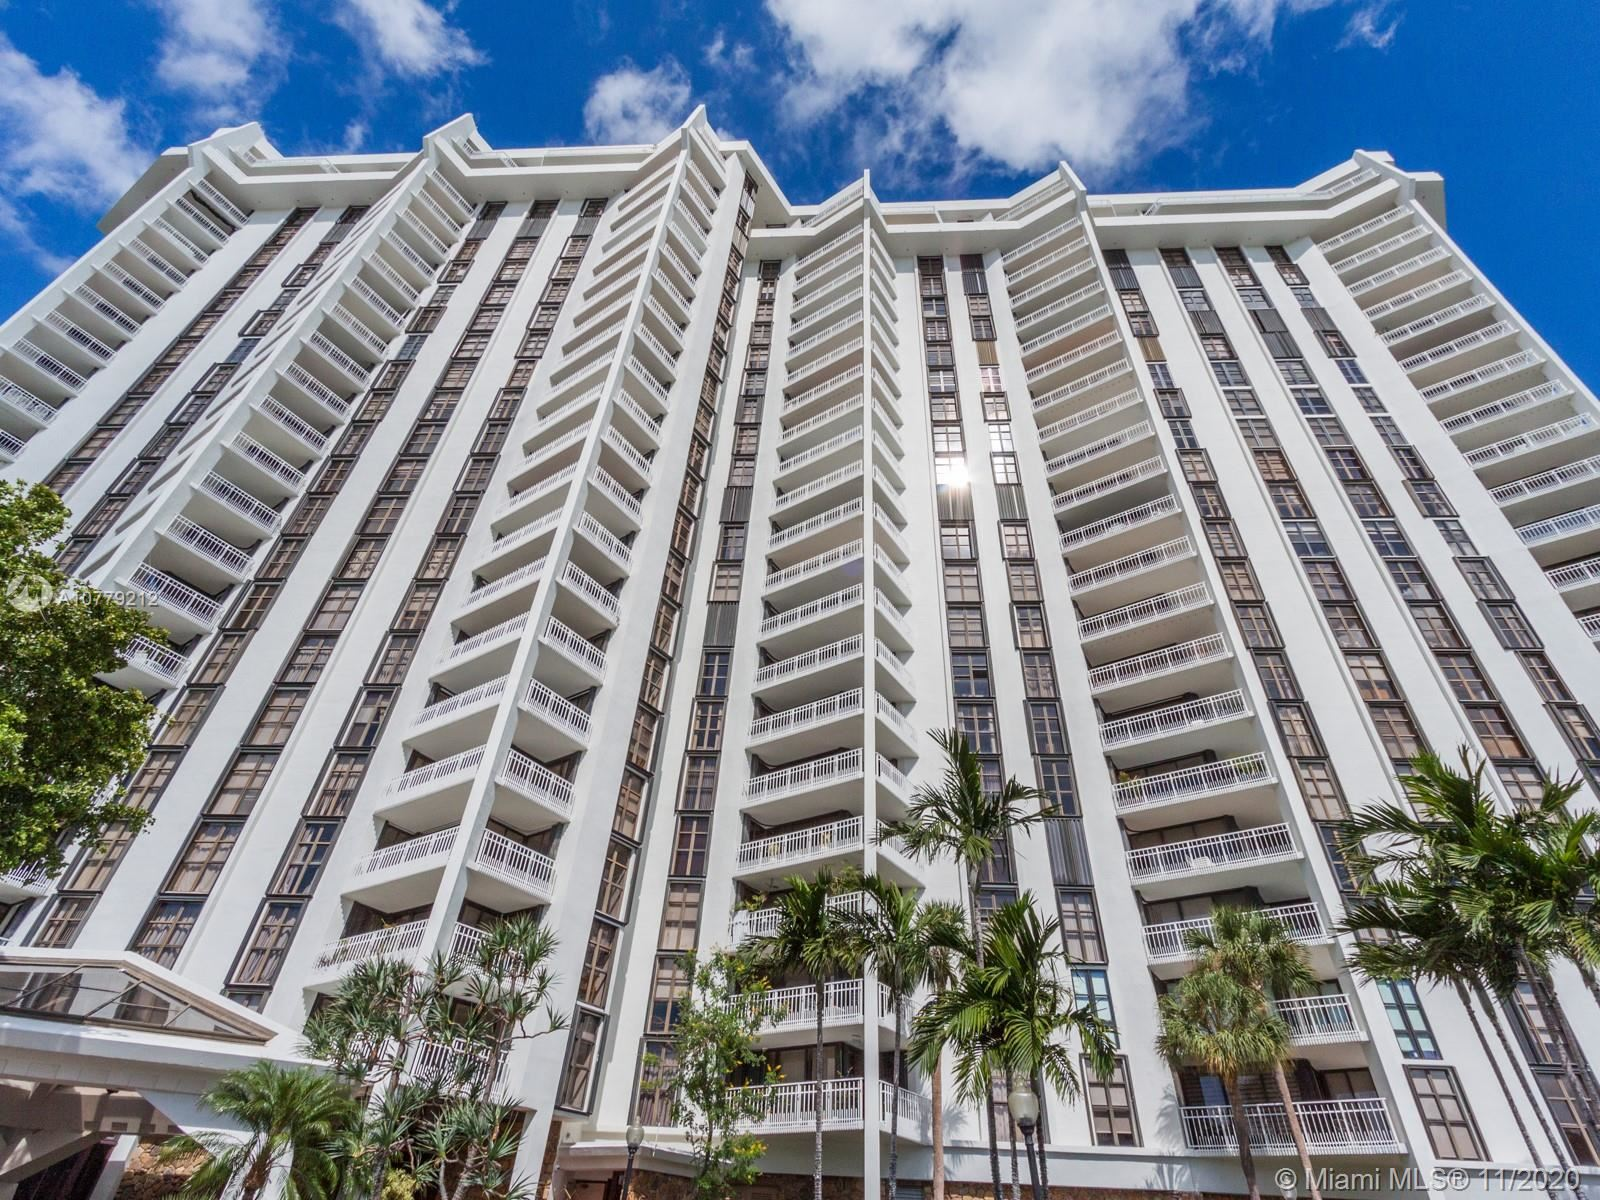 4000 Towerside Ter #1105, Miami, FL 33138 - #: A10779212